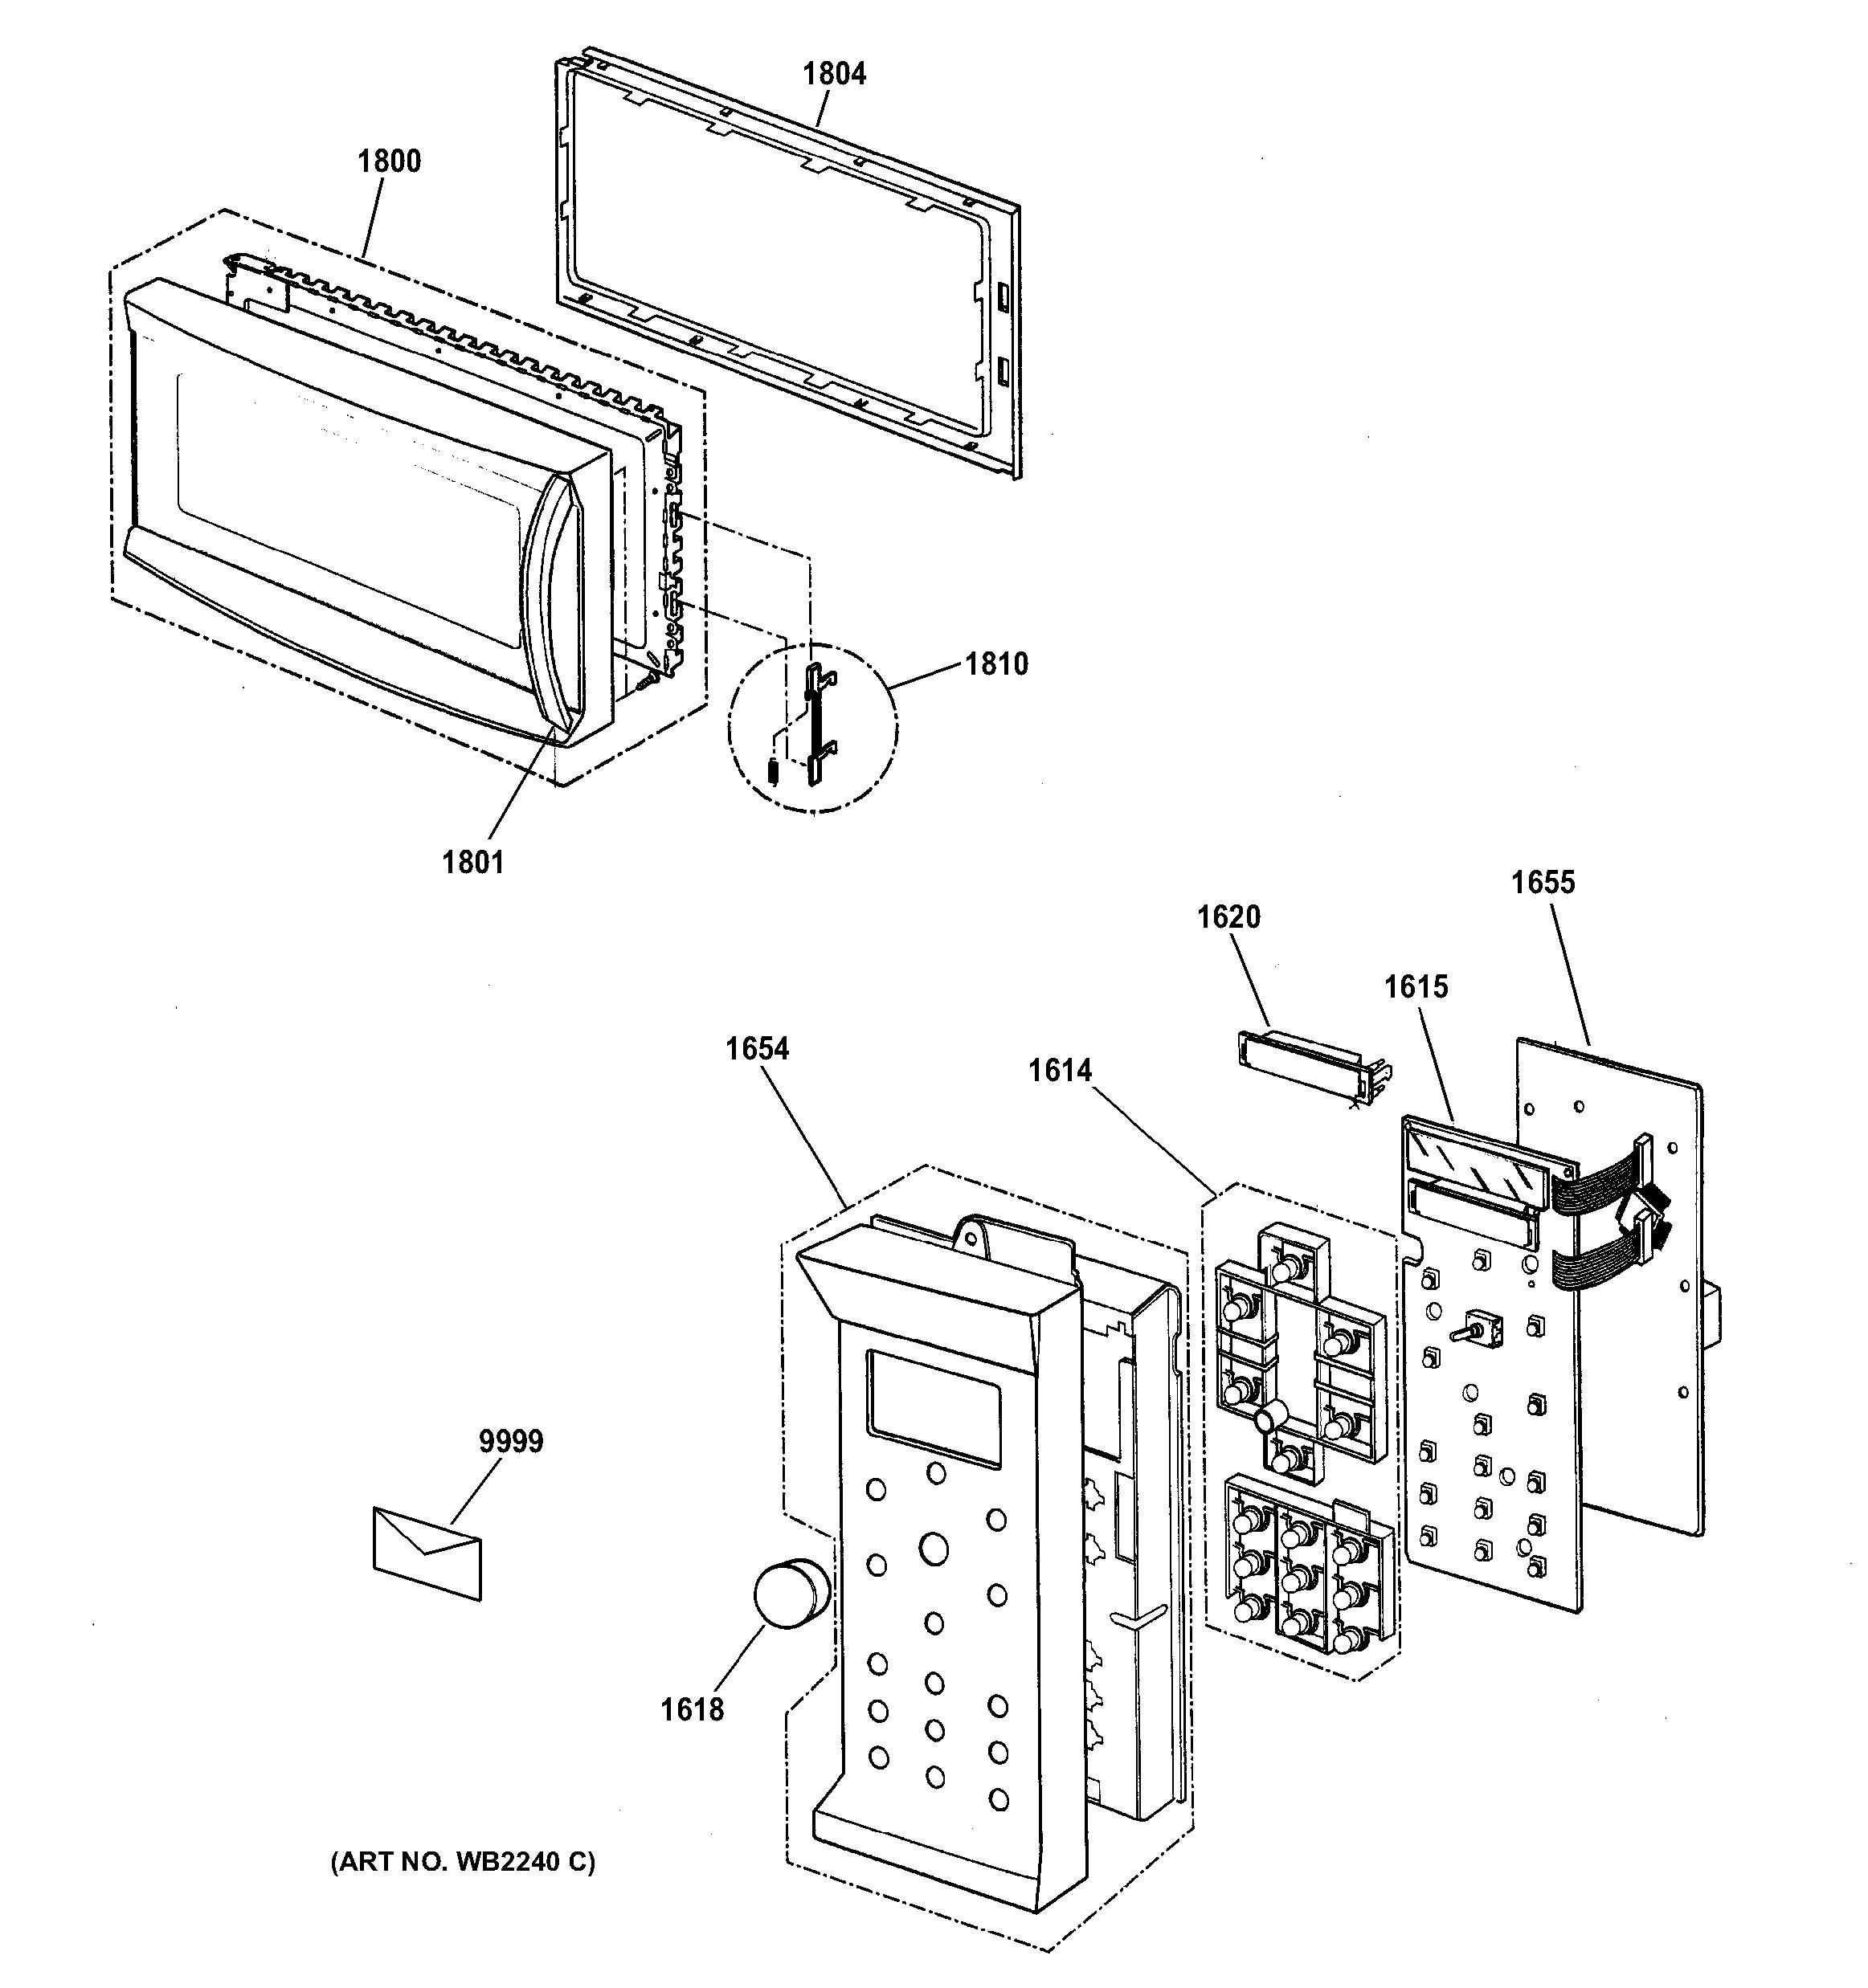 Ge Advantium 120 Parts Diagram Ge Model Sca1000dbb03 Microwave Hood Bo Genuine Parts Of Ge Advantium 120 Parts Diagram